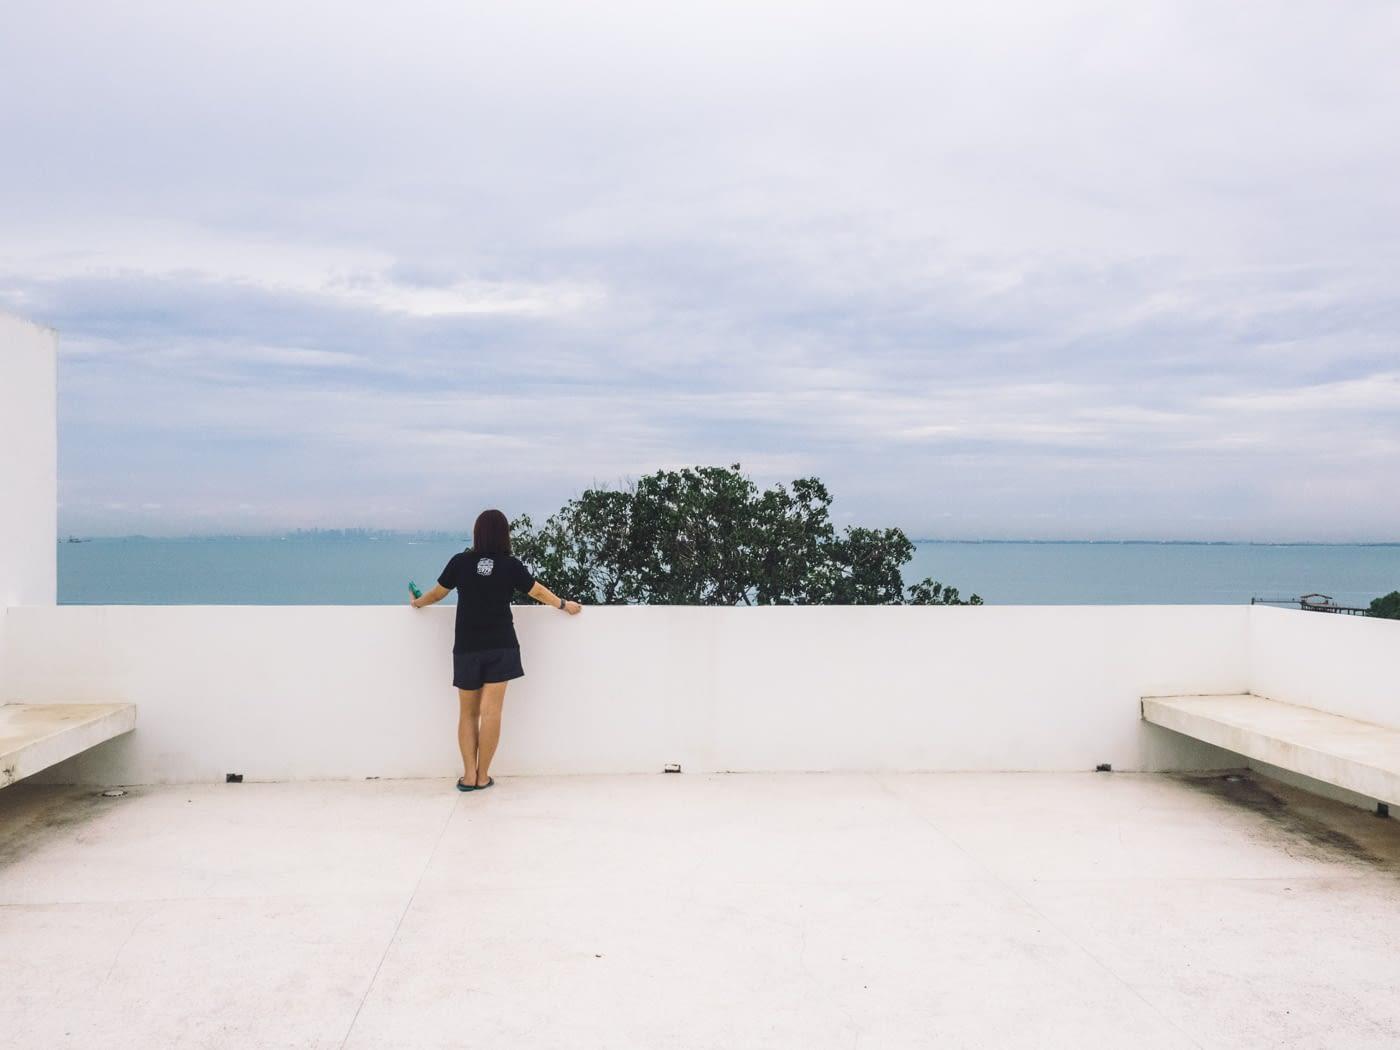 Indonesia - Montigo - Spacious rooftop